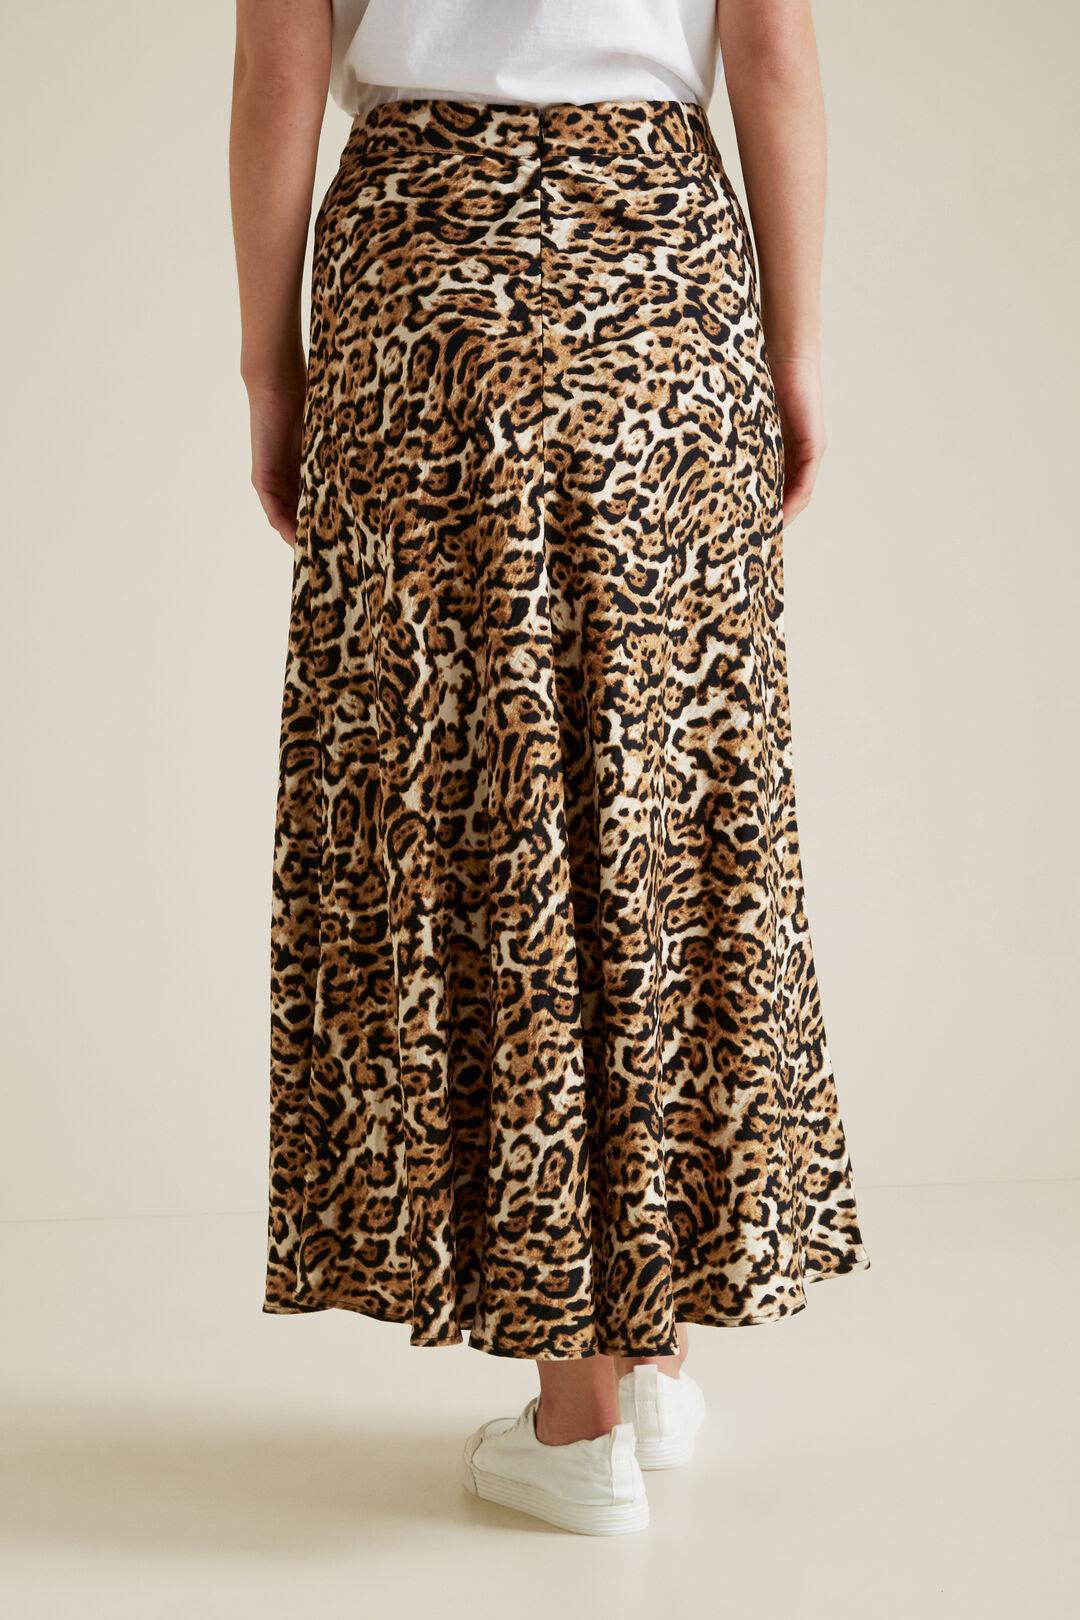 Printed Swing Skirt  LEOPARD  hi-res